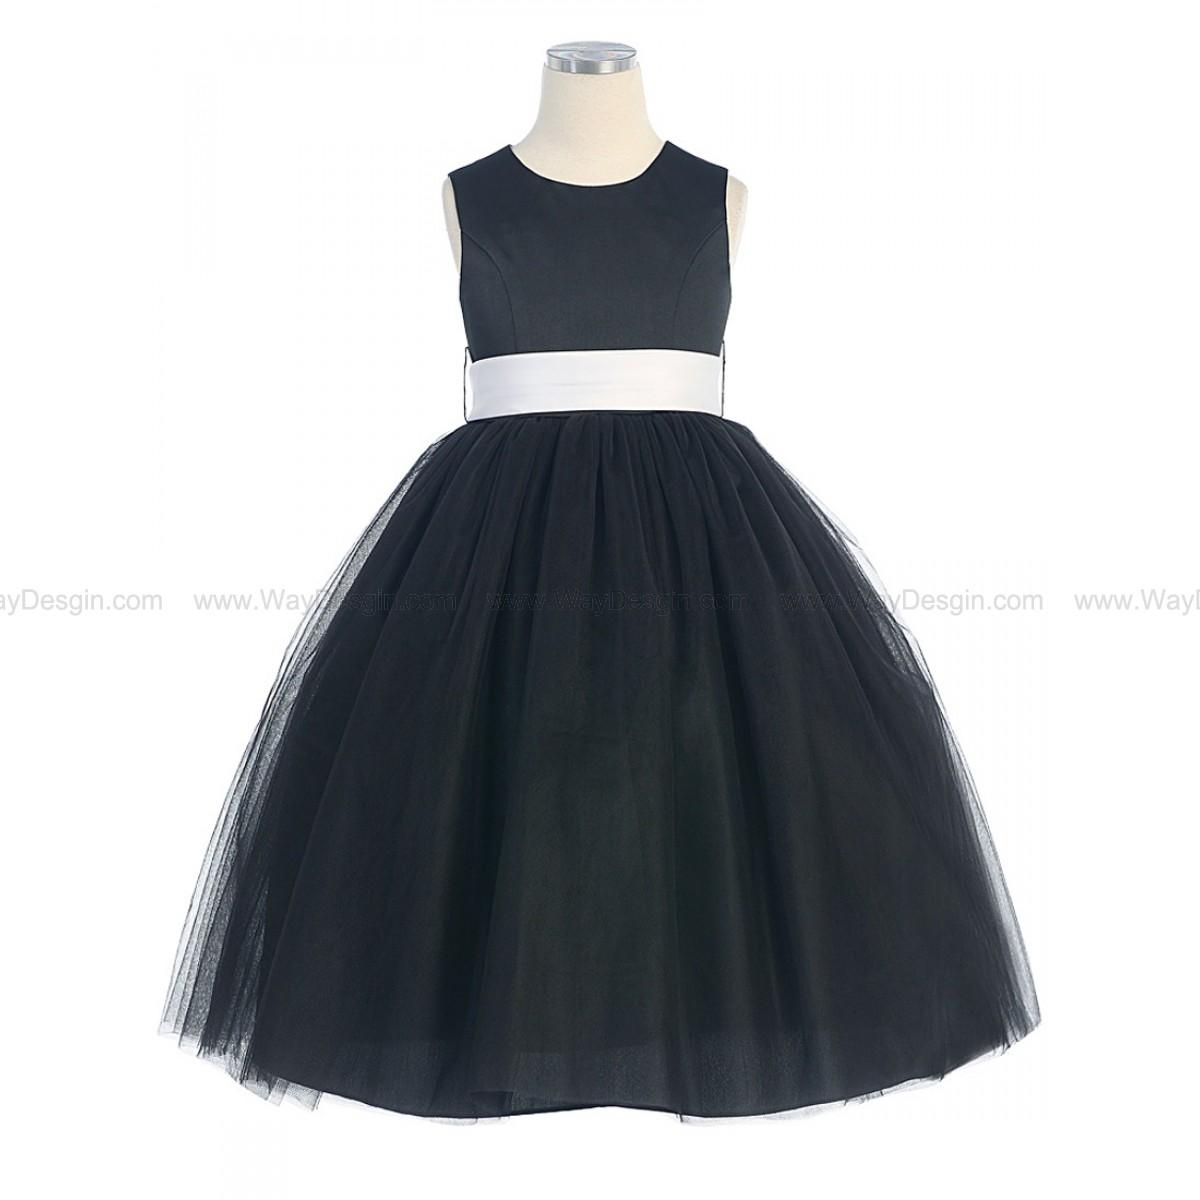 Black Satin Tulle Dress Removable Sash